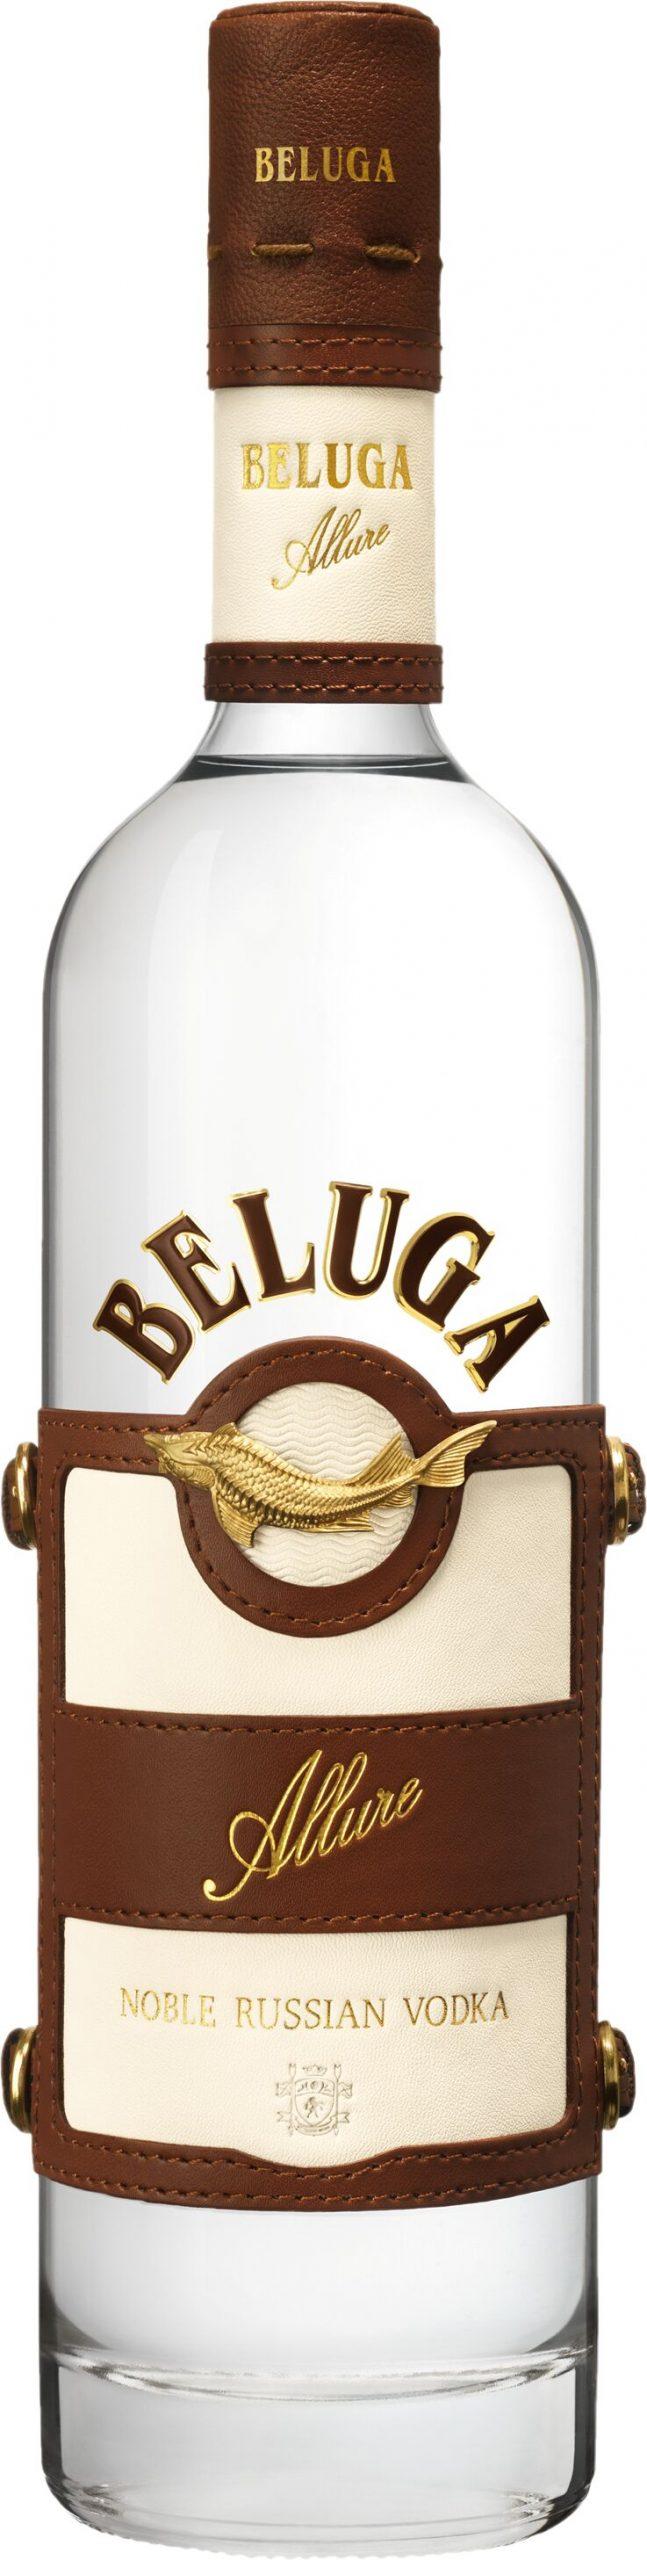 beluga allure